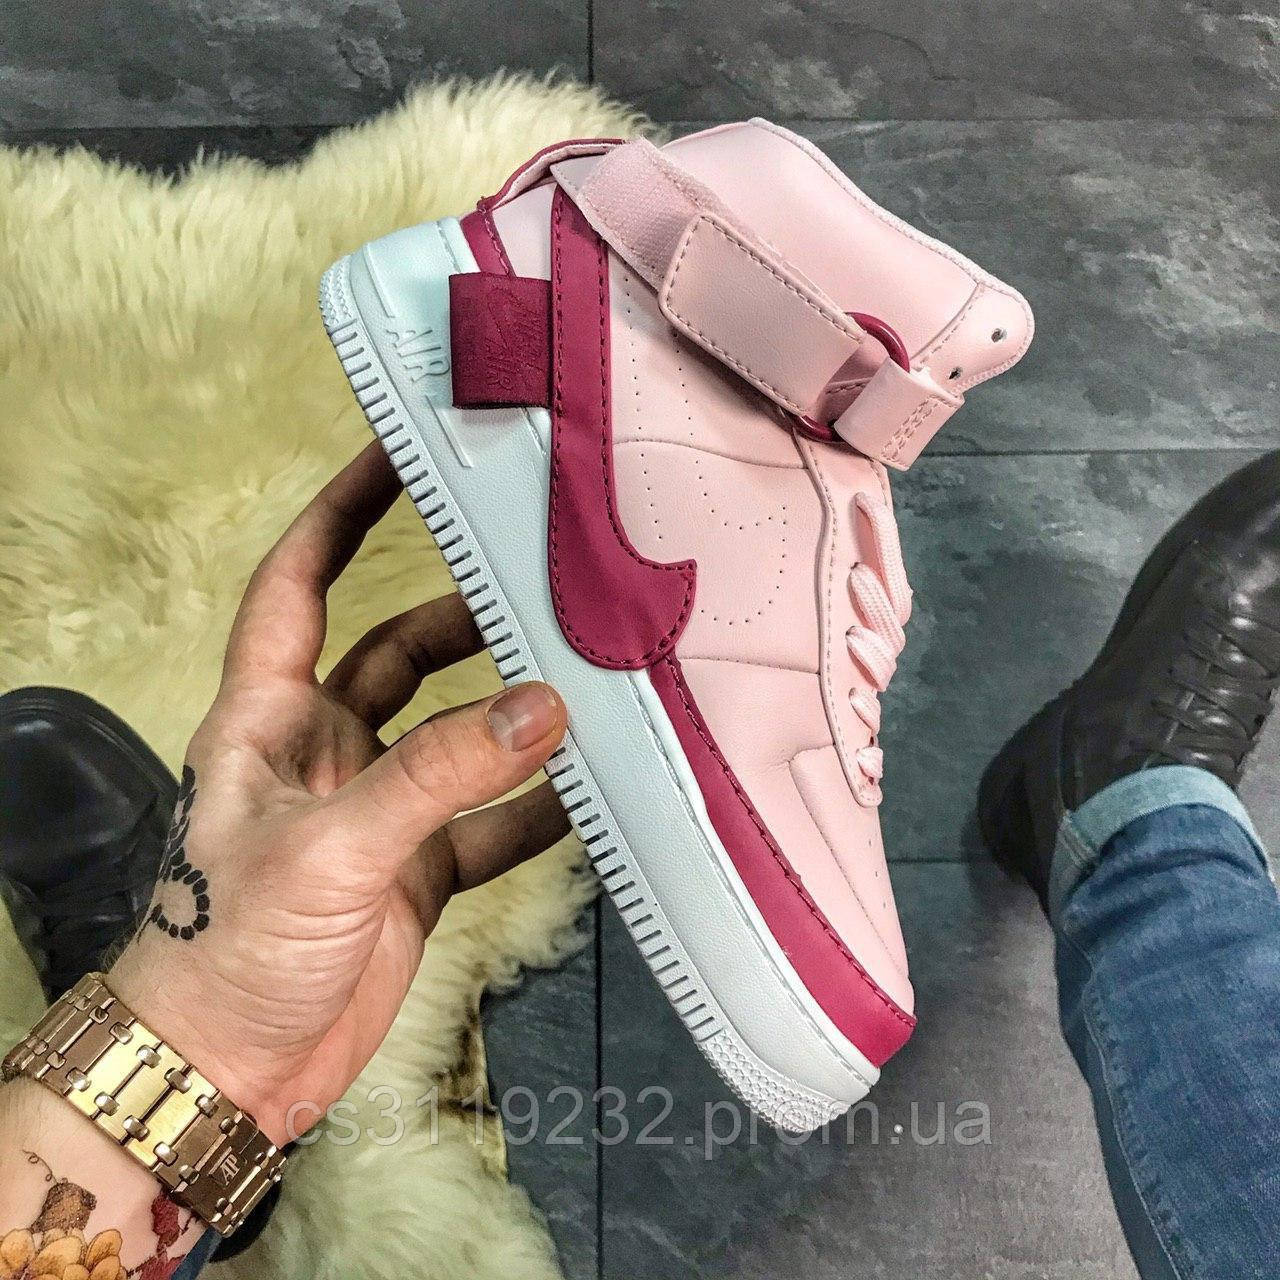 Женские кроссовки Nike Air Force 1 Jester High Black (розовые)